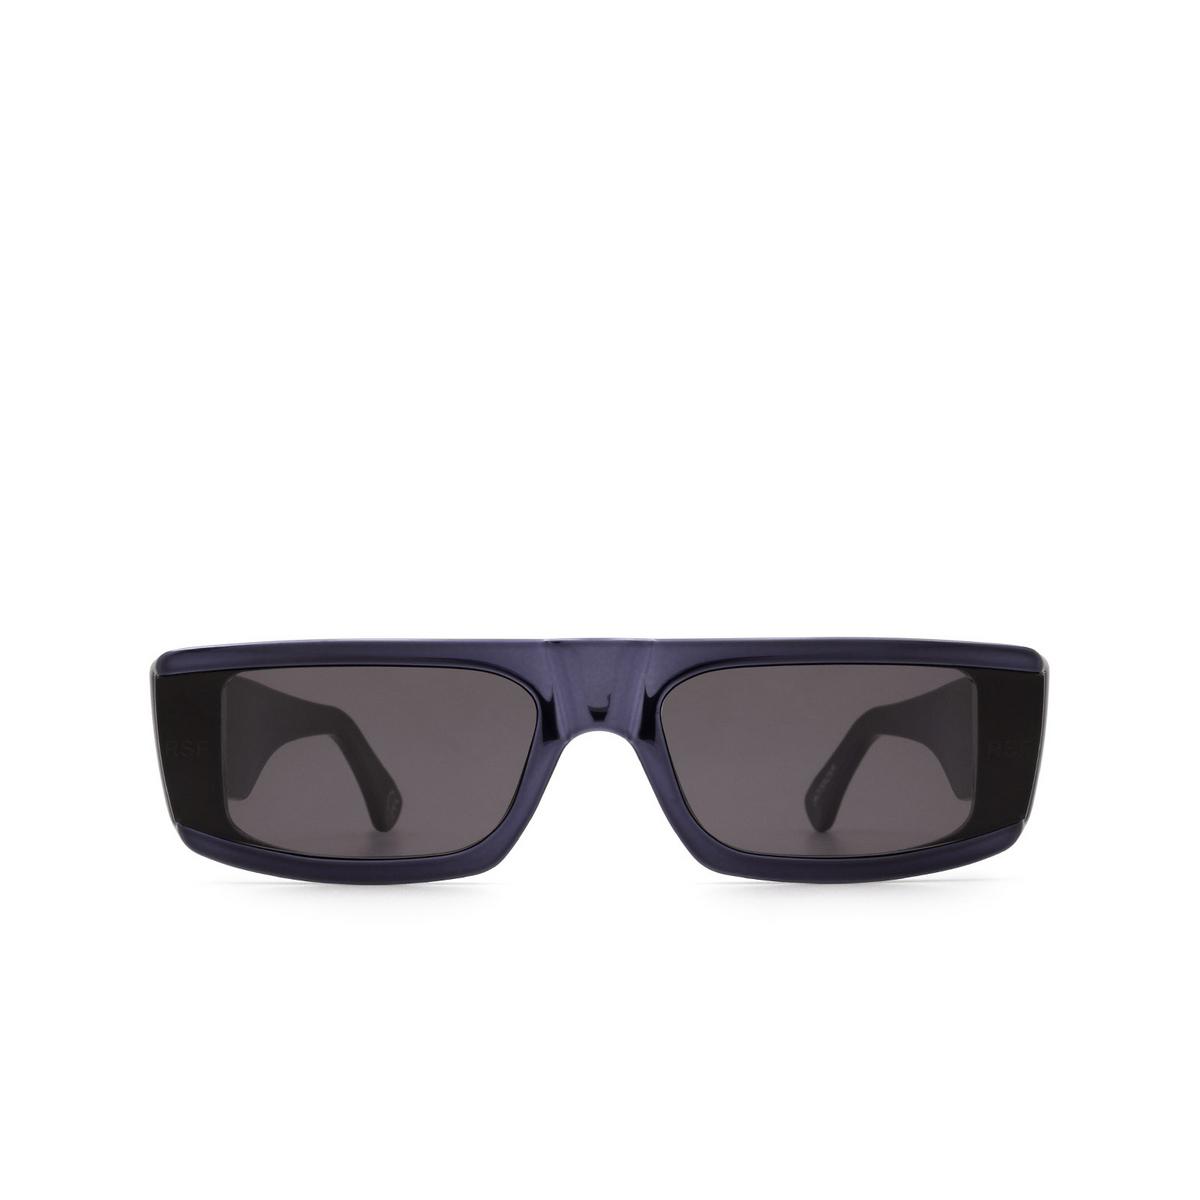 Retrosuperfuture® Rectangle Sunglasses: Issimo color Chrome Blackish UK2 - front view.